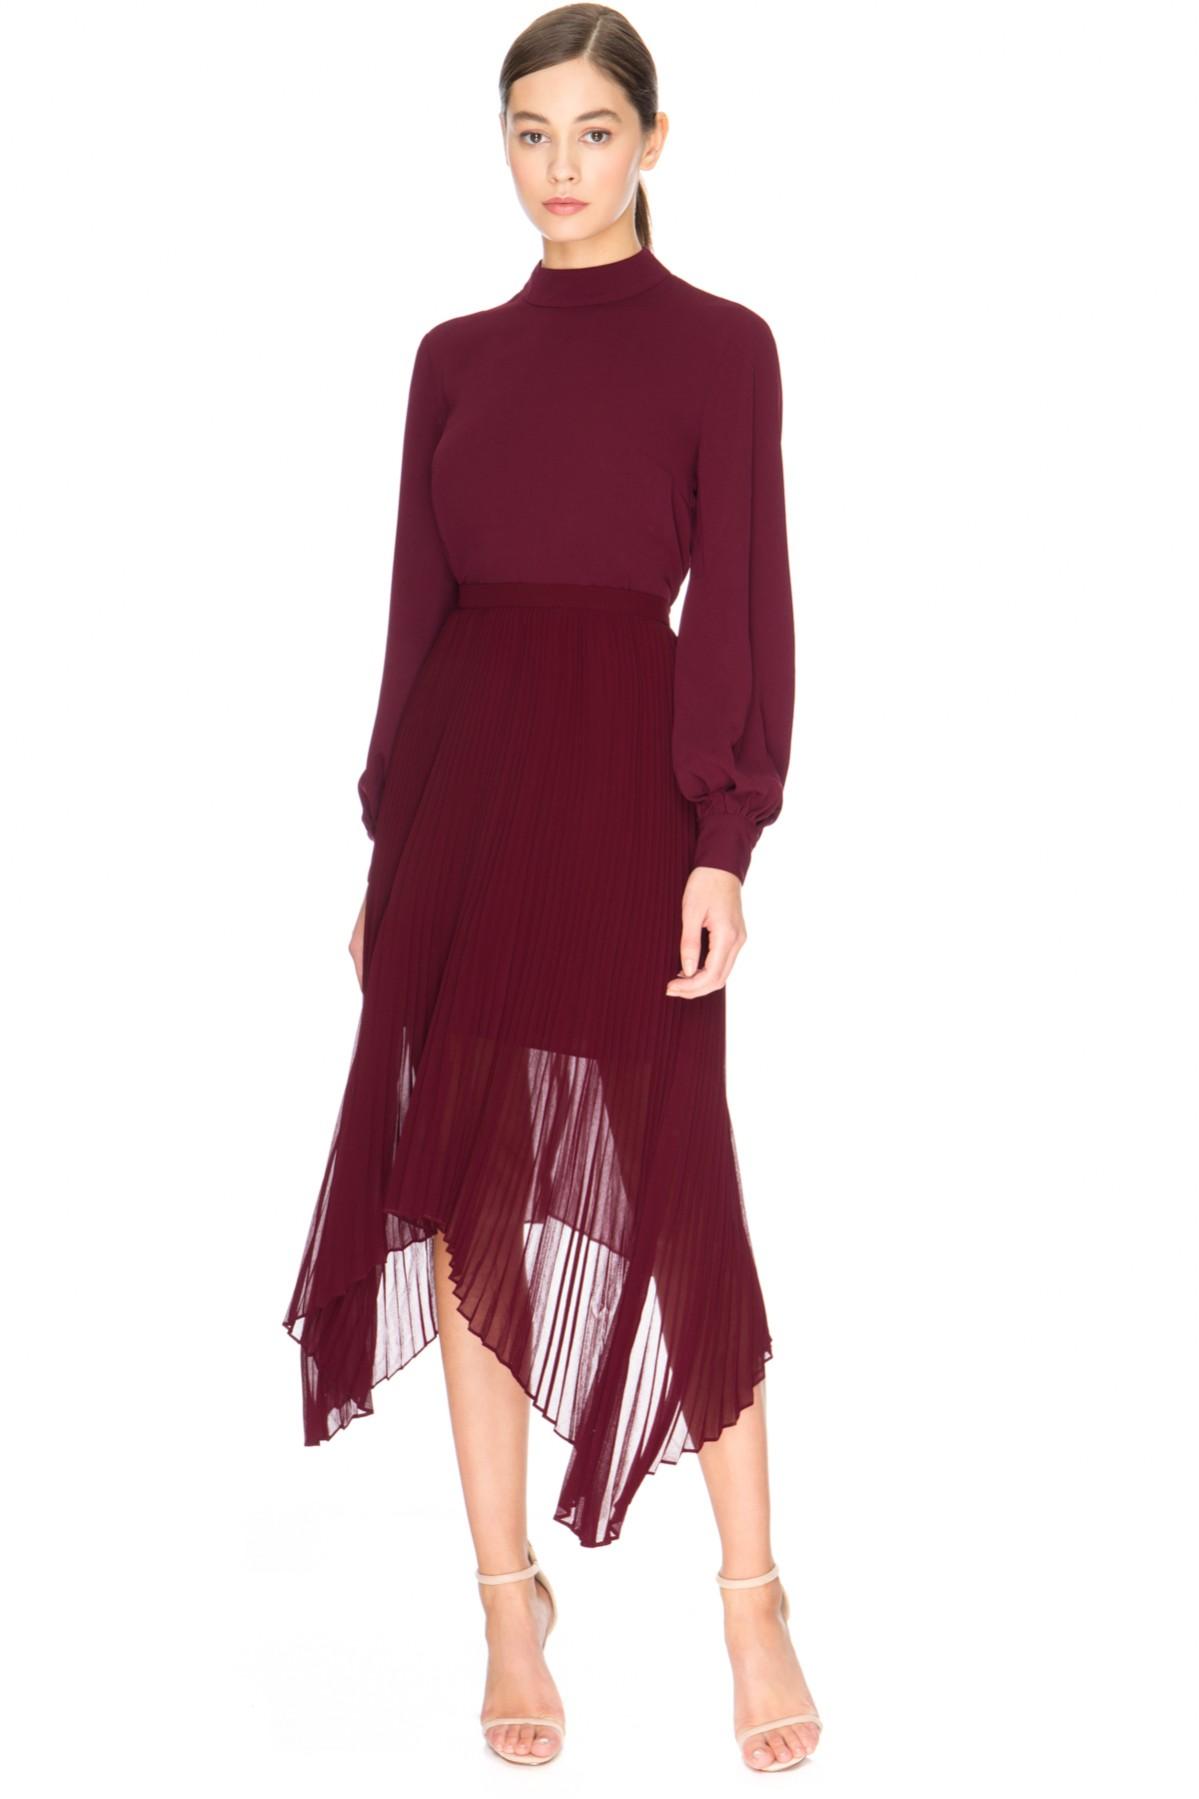 Shop Keepsake Irreplaceable L/S Top + Clarity Skirt.